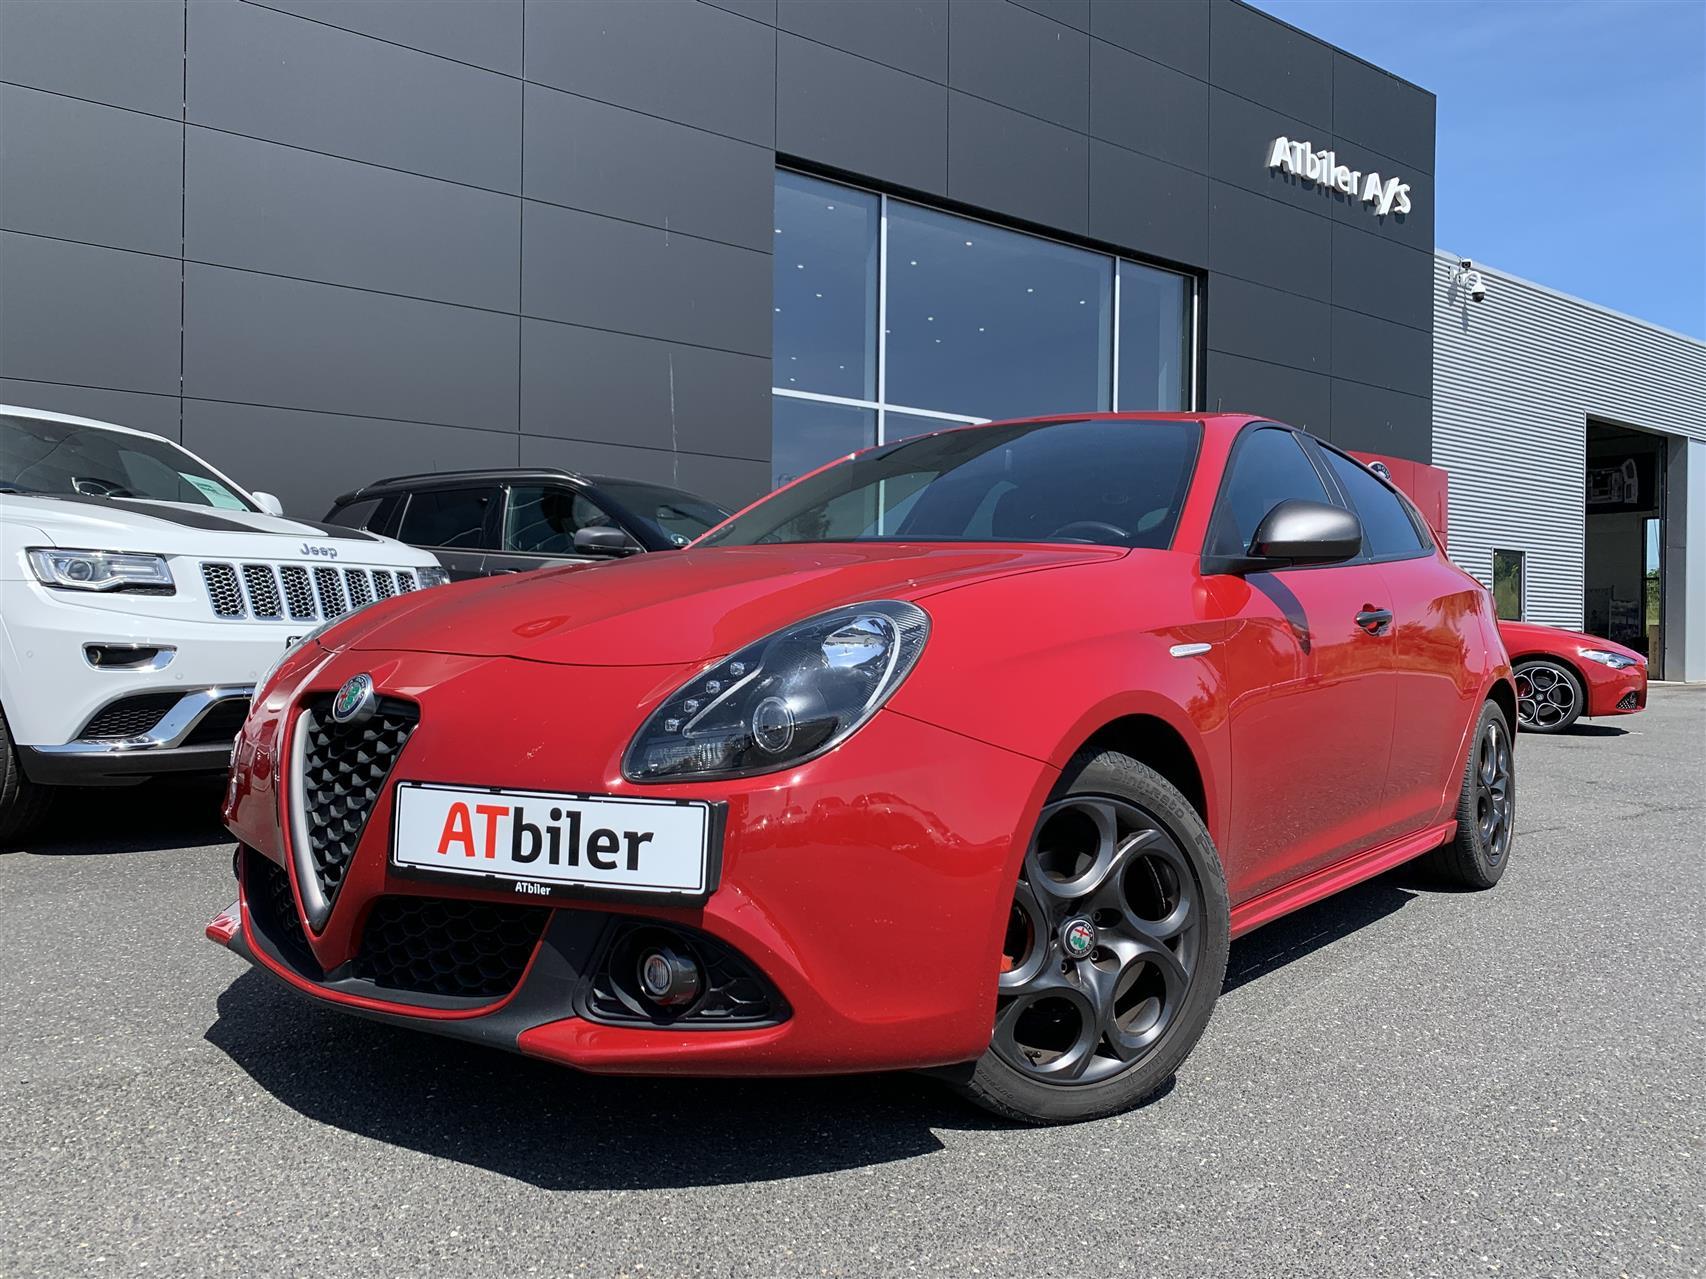 Billede af Alfa Romeo Giulietta 1,6 JTDM TCT Super 120HK 5d